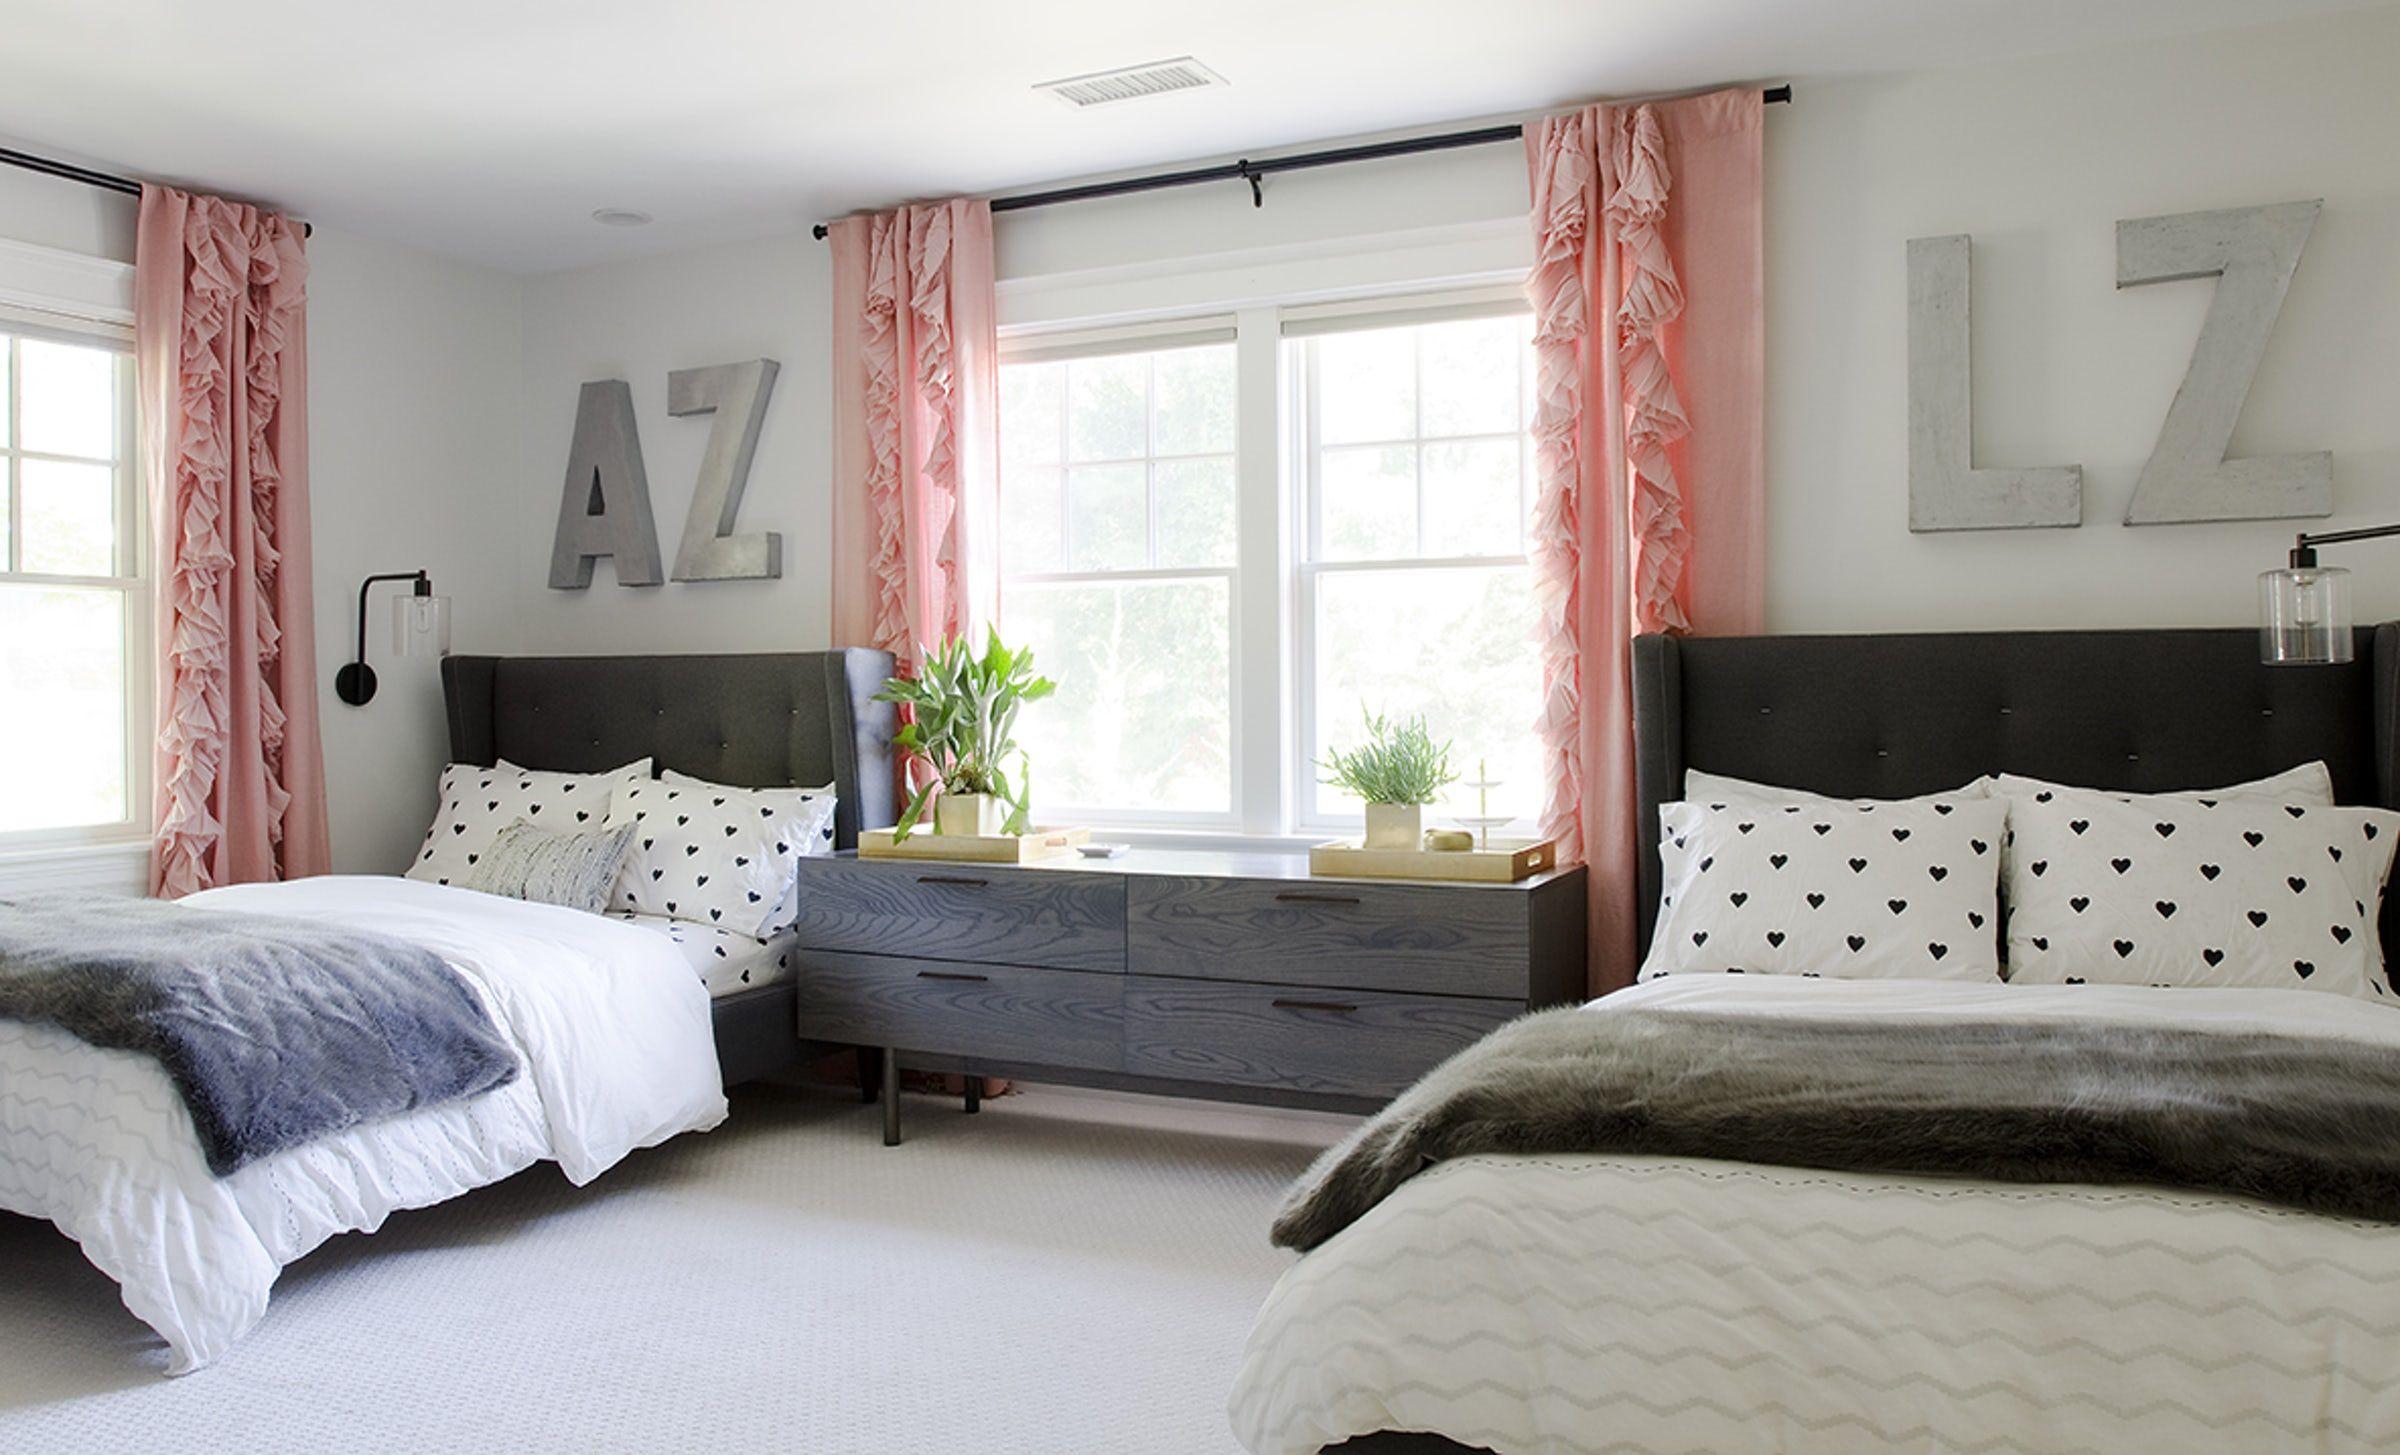 15 creative girls room ideas how to decorate a girl\u0027s bedroomInterior Design Teenage Bedrooms #4